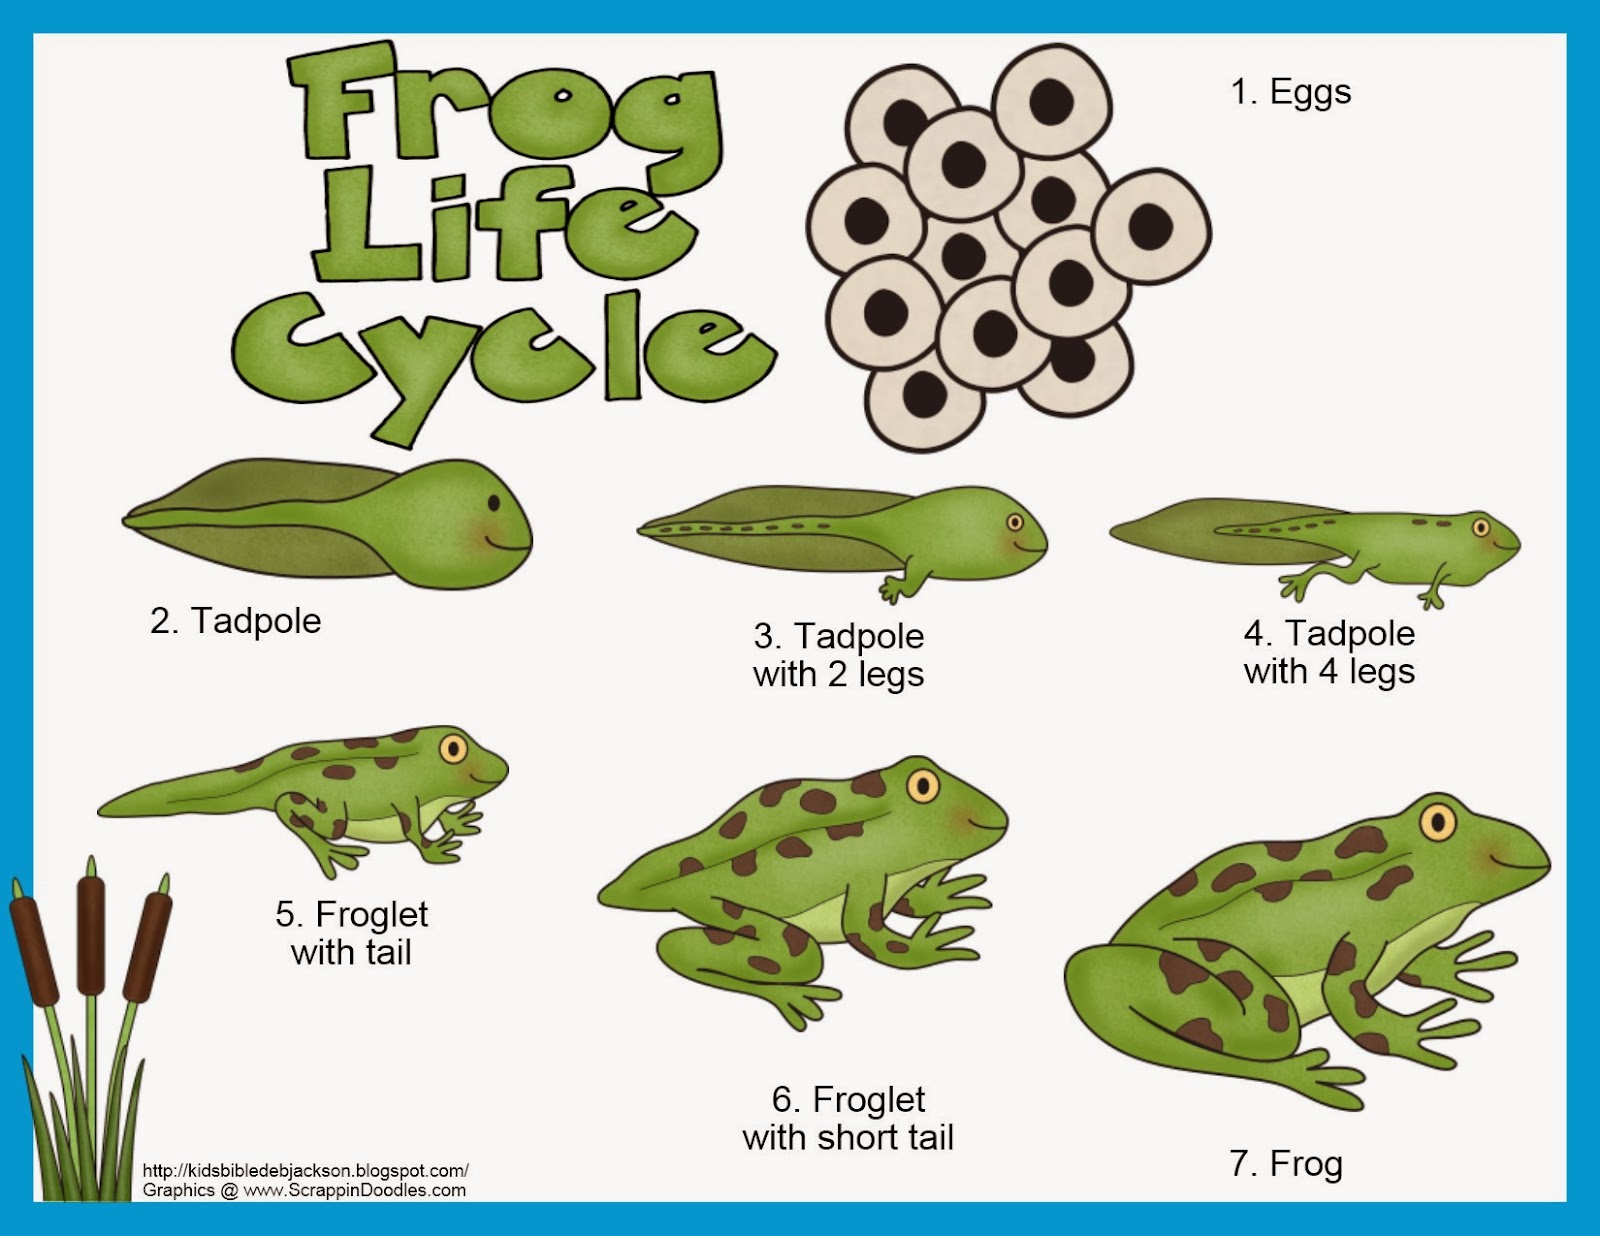 Frog life cycle eggs - photo#3